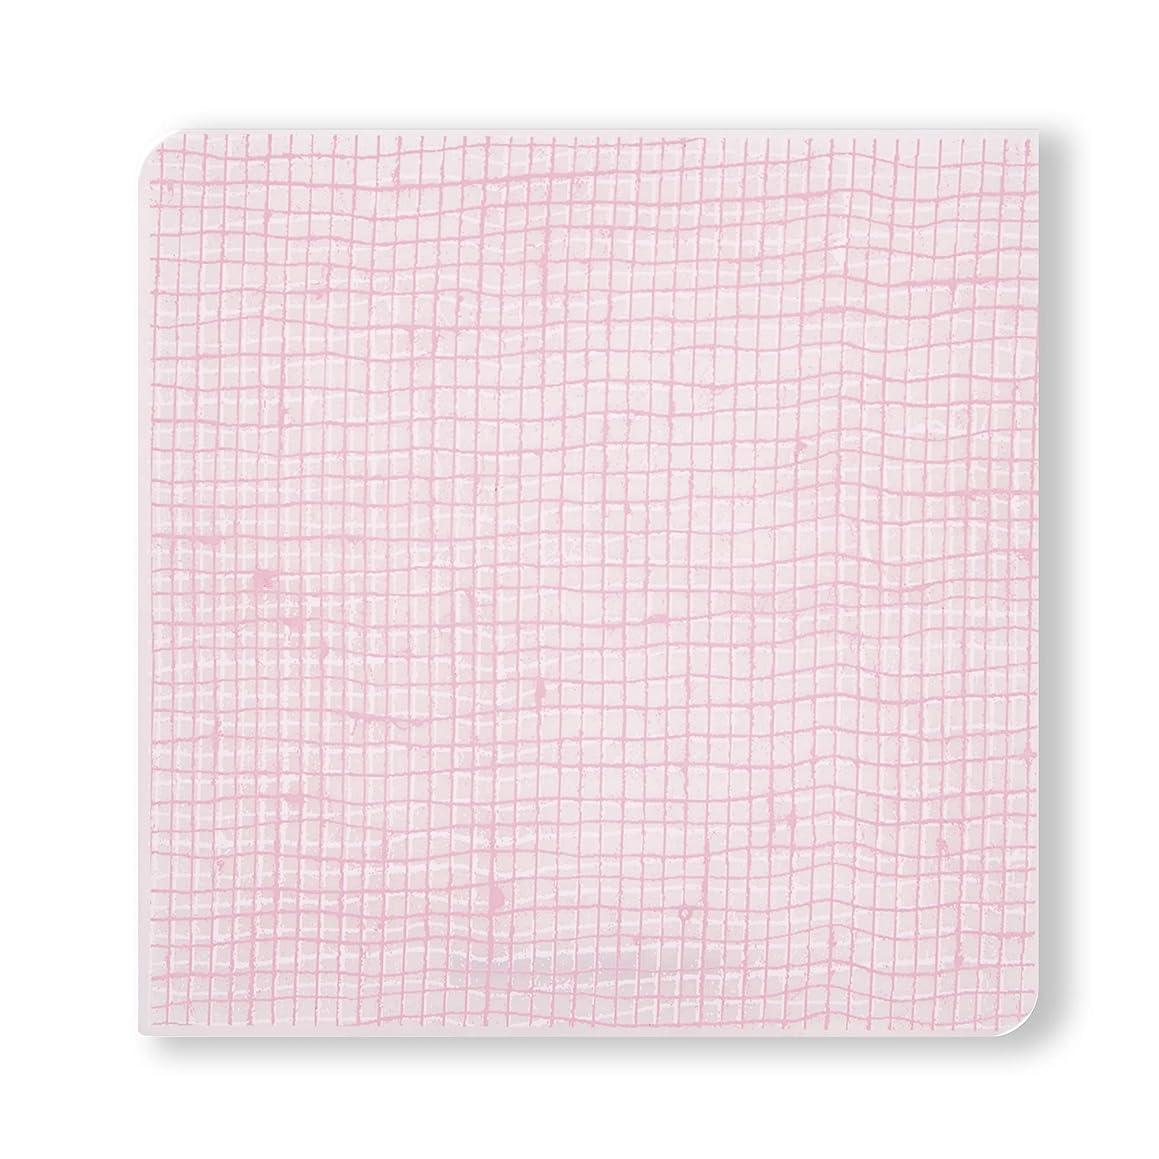 modern-twist Linen Print Set of 4 Coasters 100% plastic free silicone, tabletop, dining, decoration, modern design, Blush